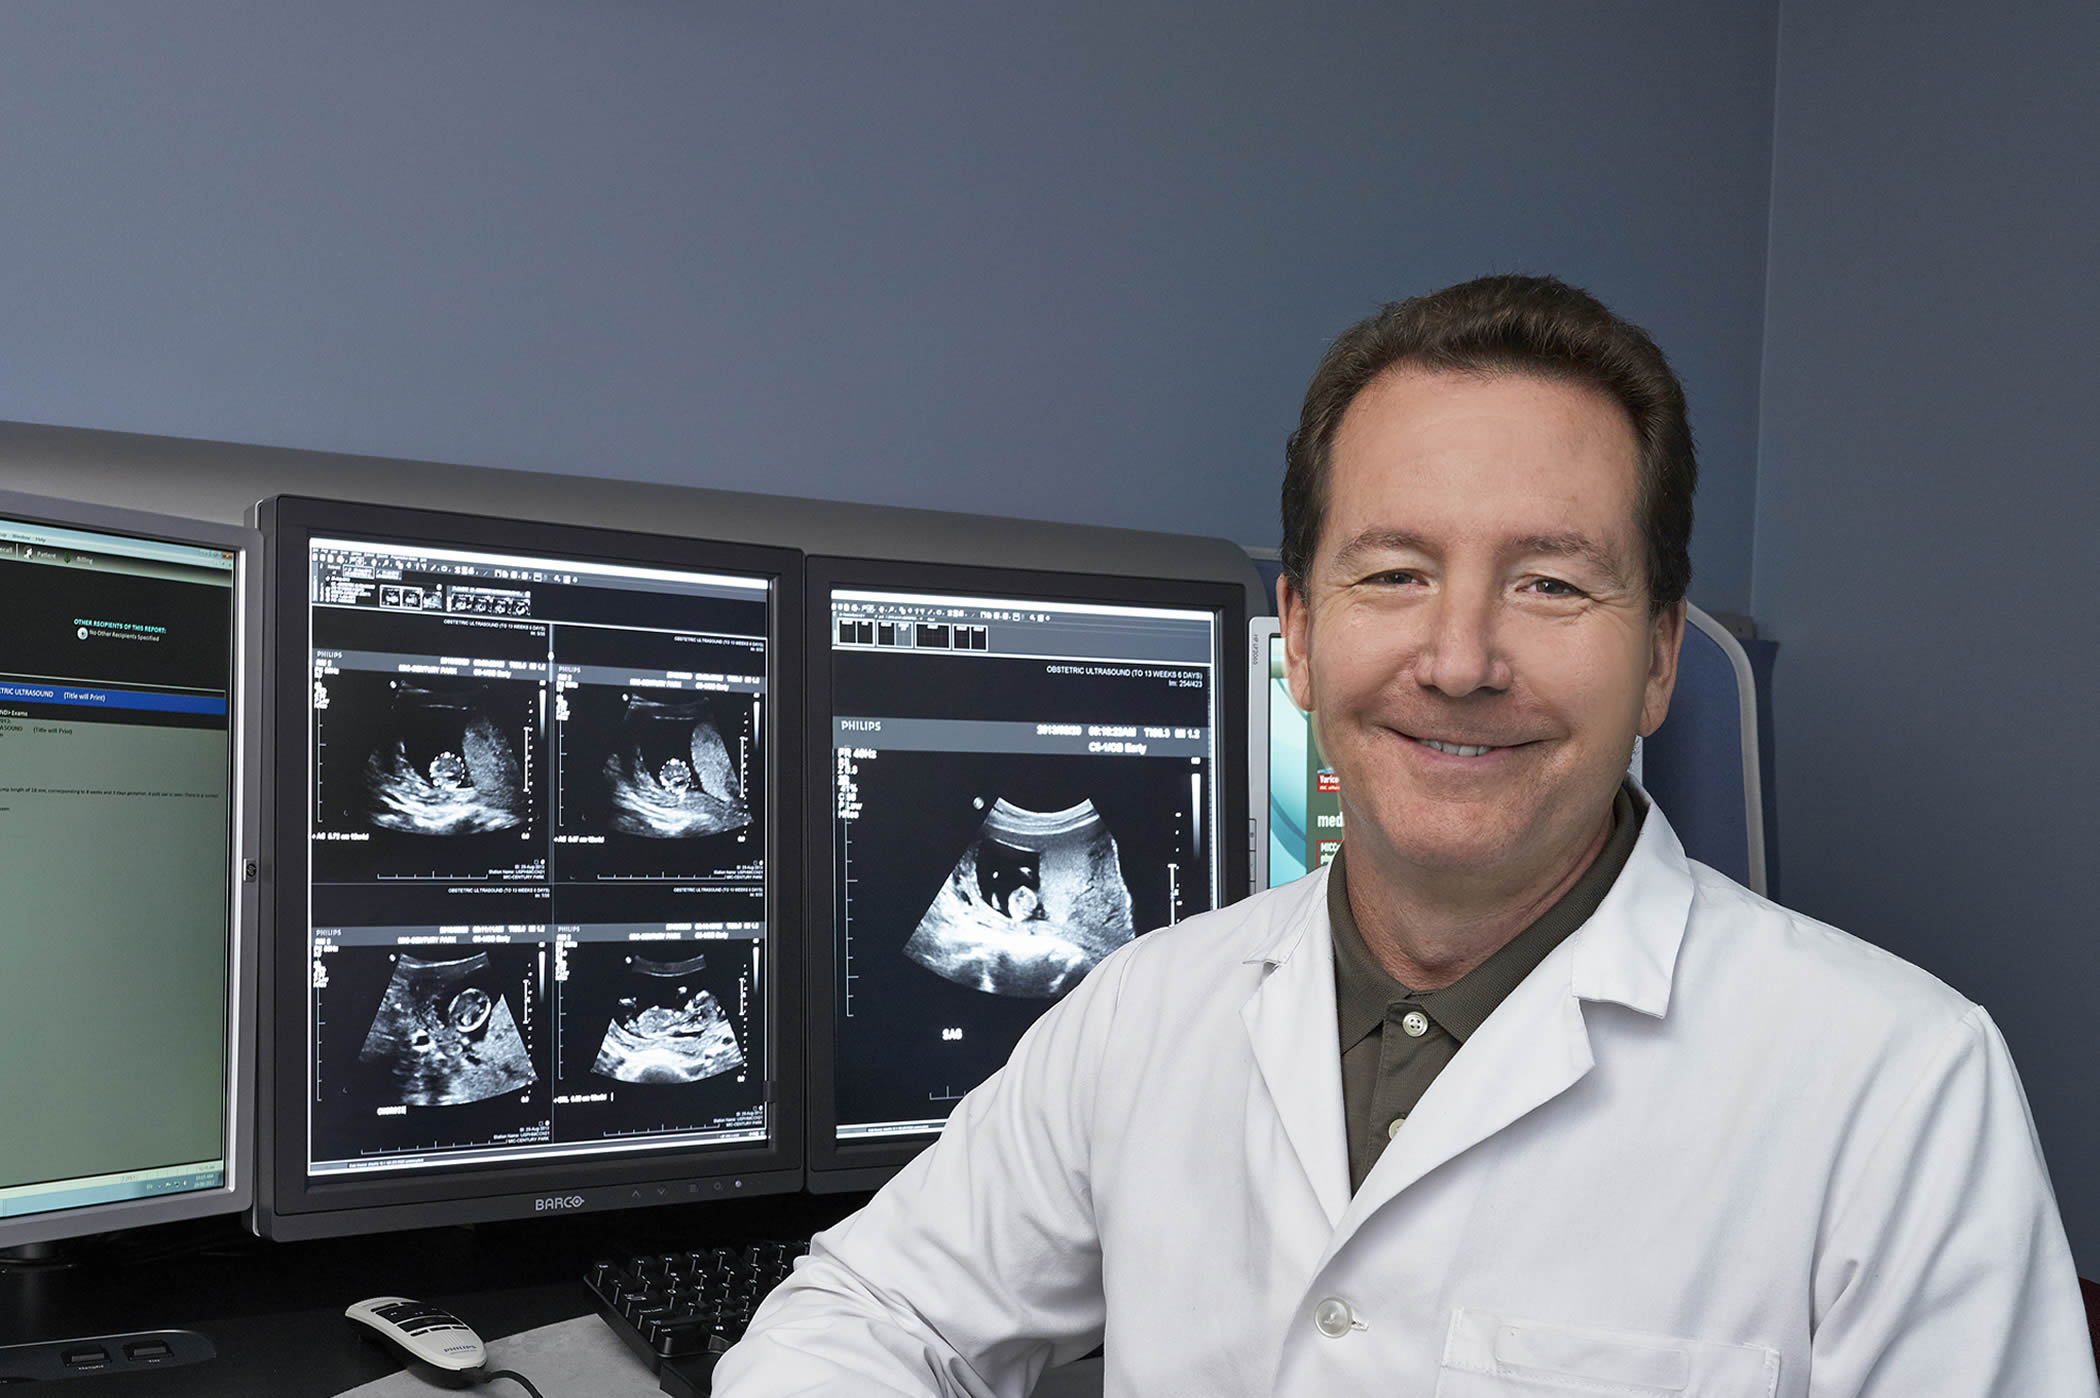 Reporting Radiologist